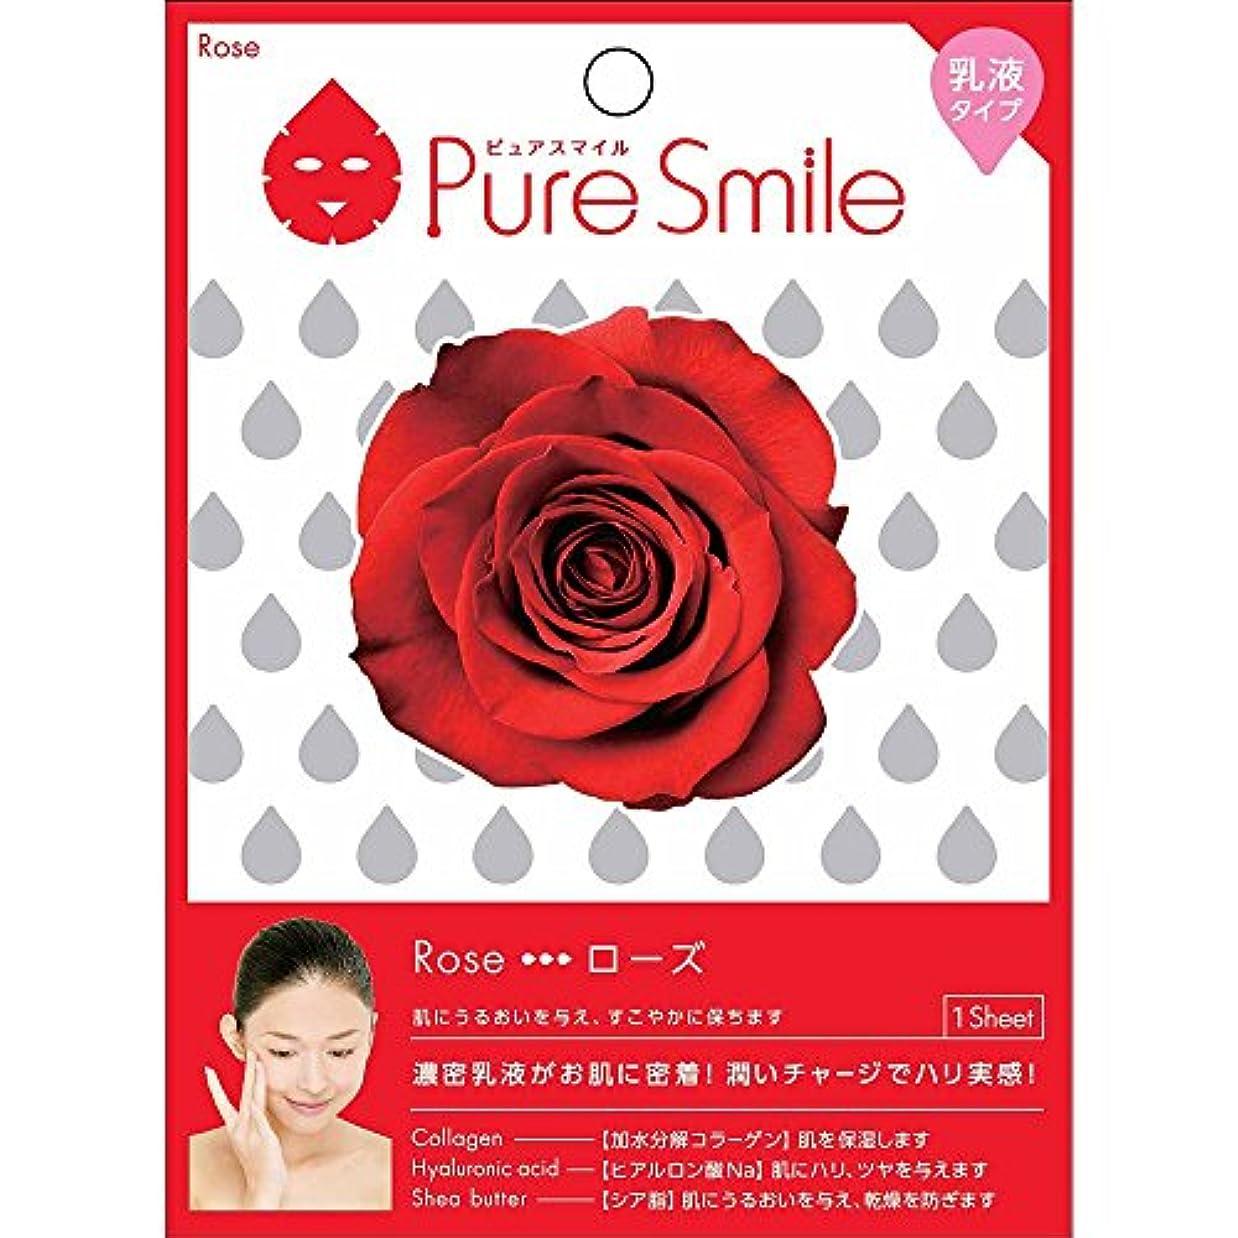 Pure Smile(ピュアスマイル) 乳液エッセンスマスク 1 枚 ローズ